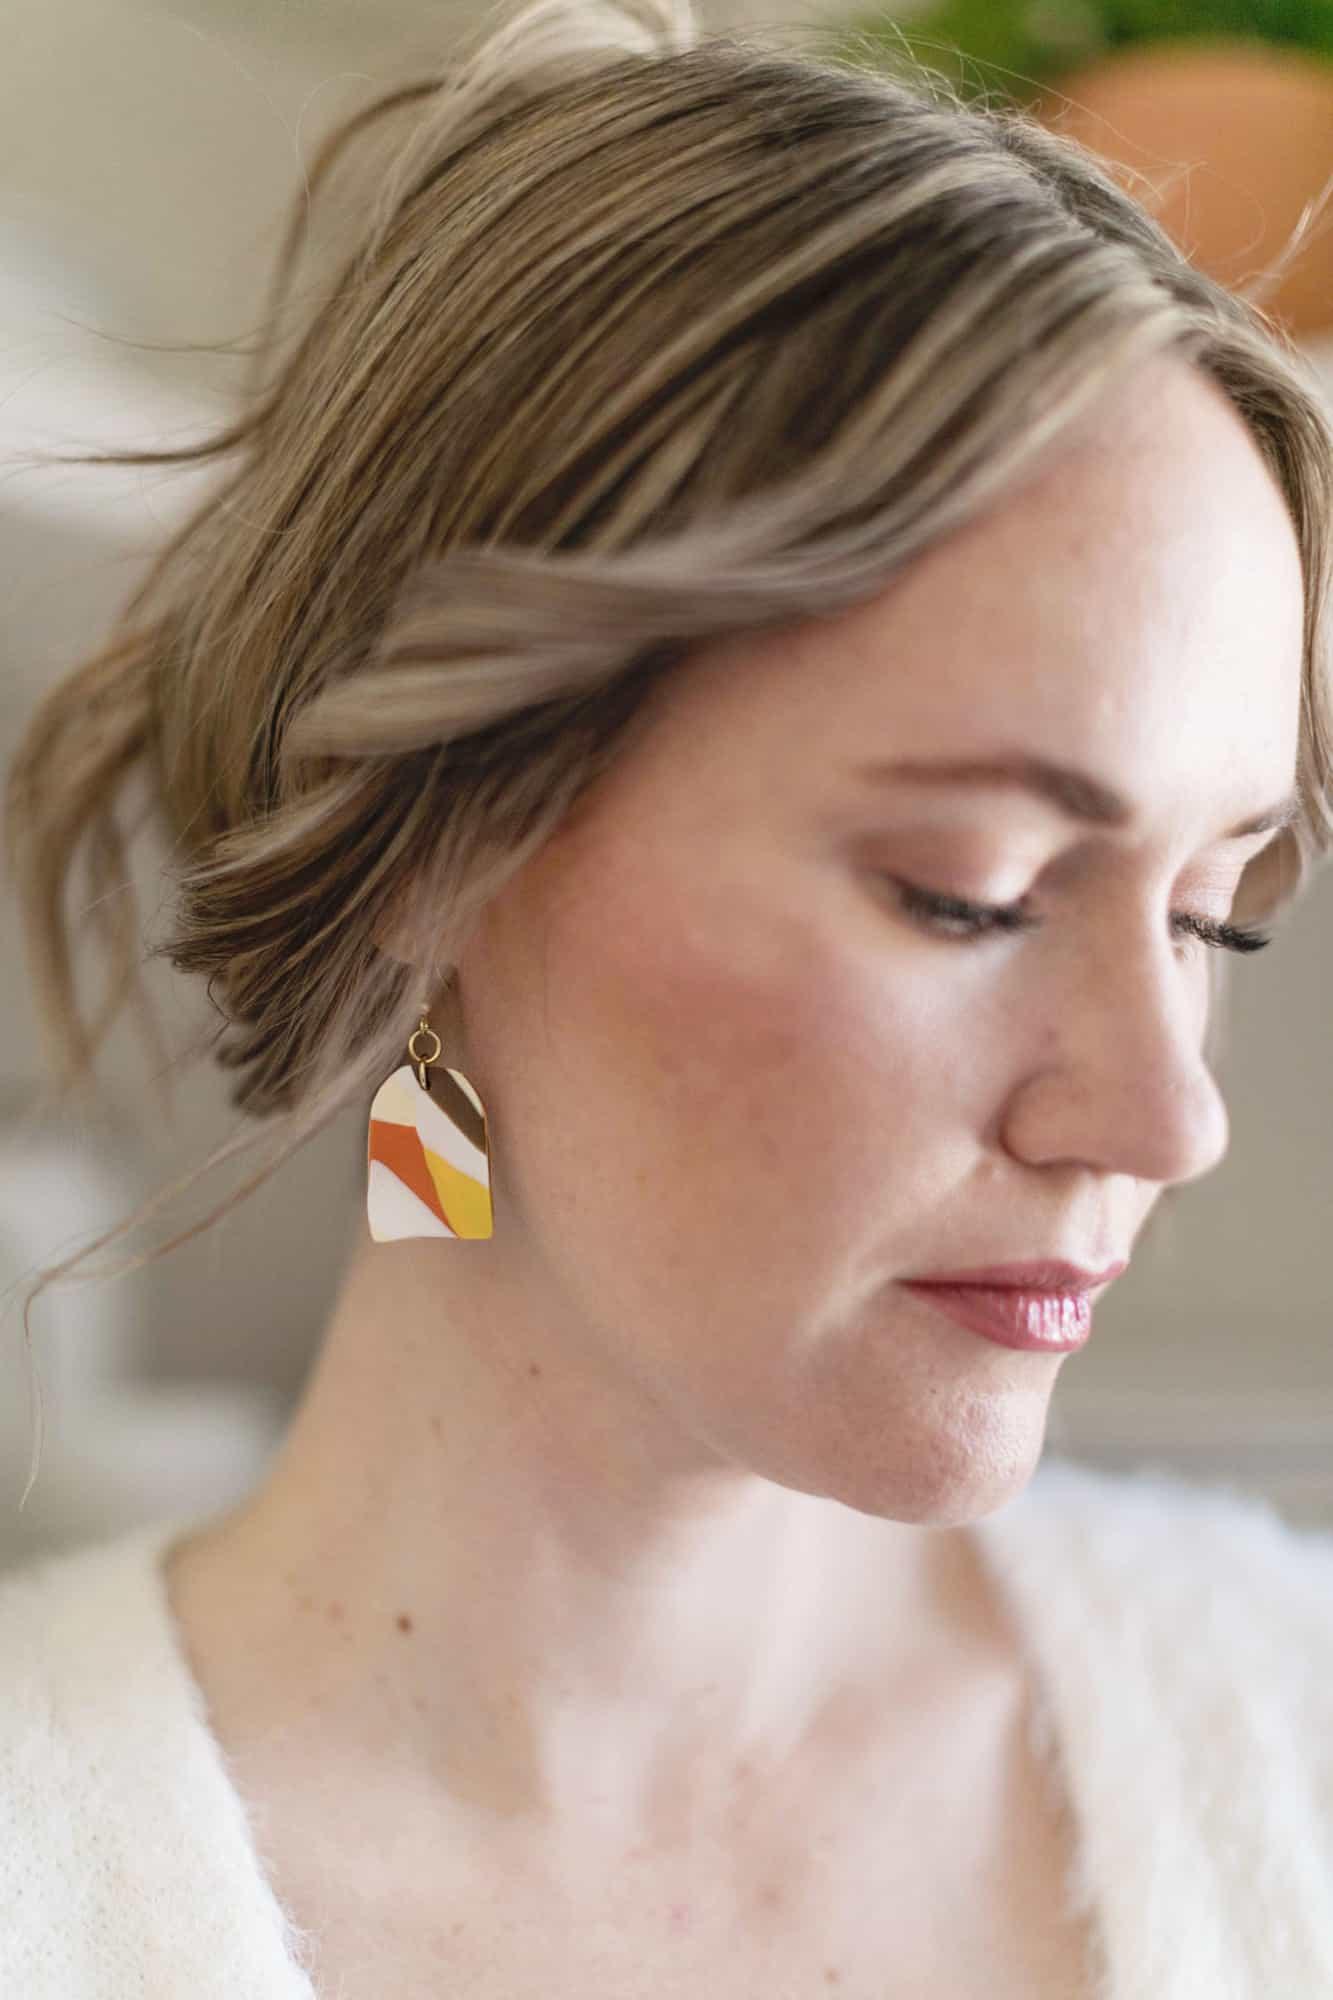 marbled clay earring DIY 1 1